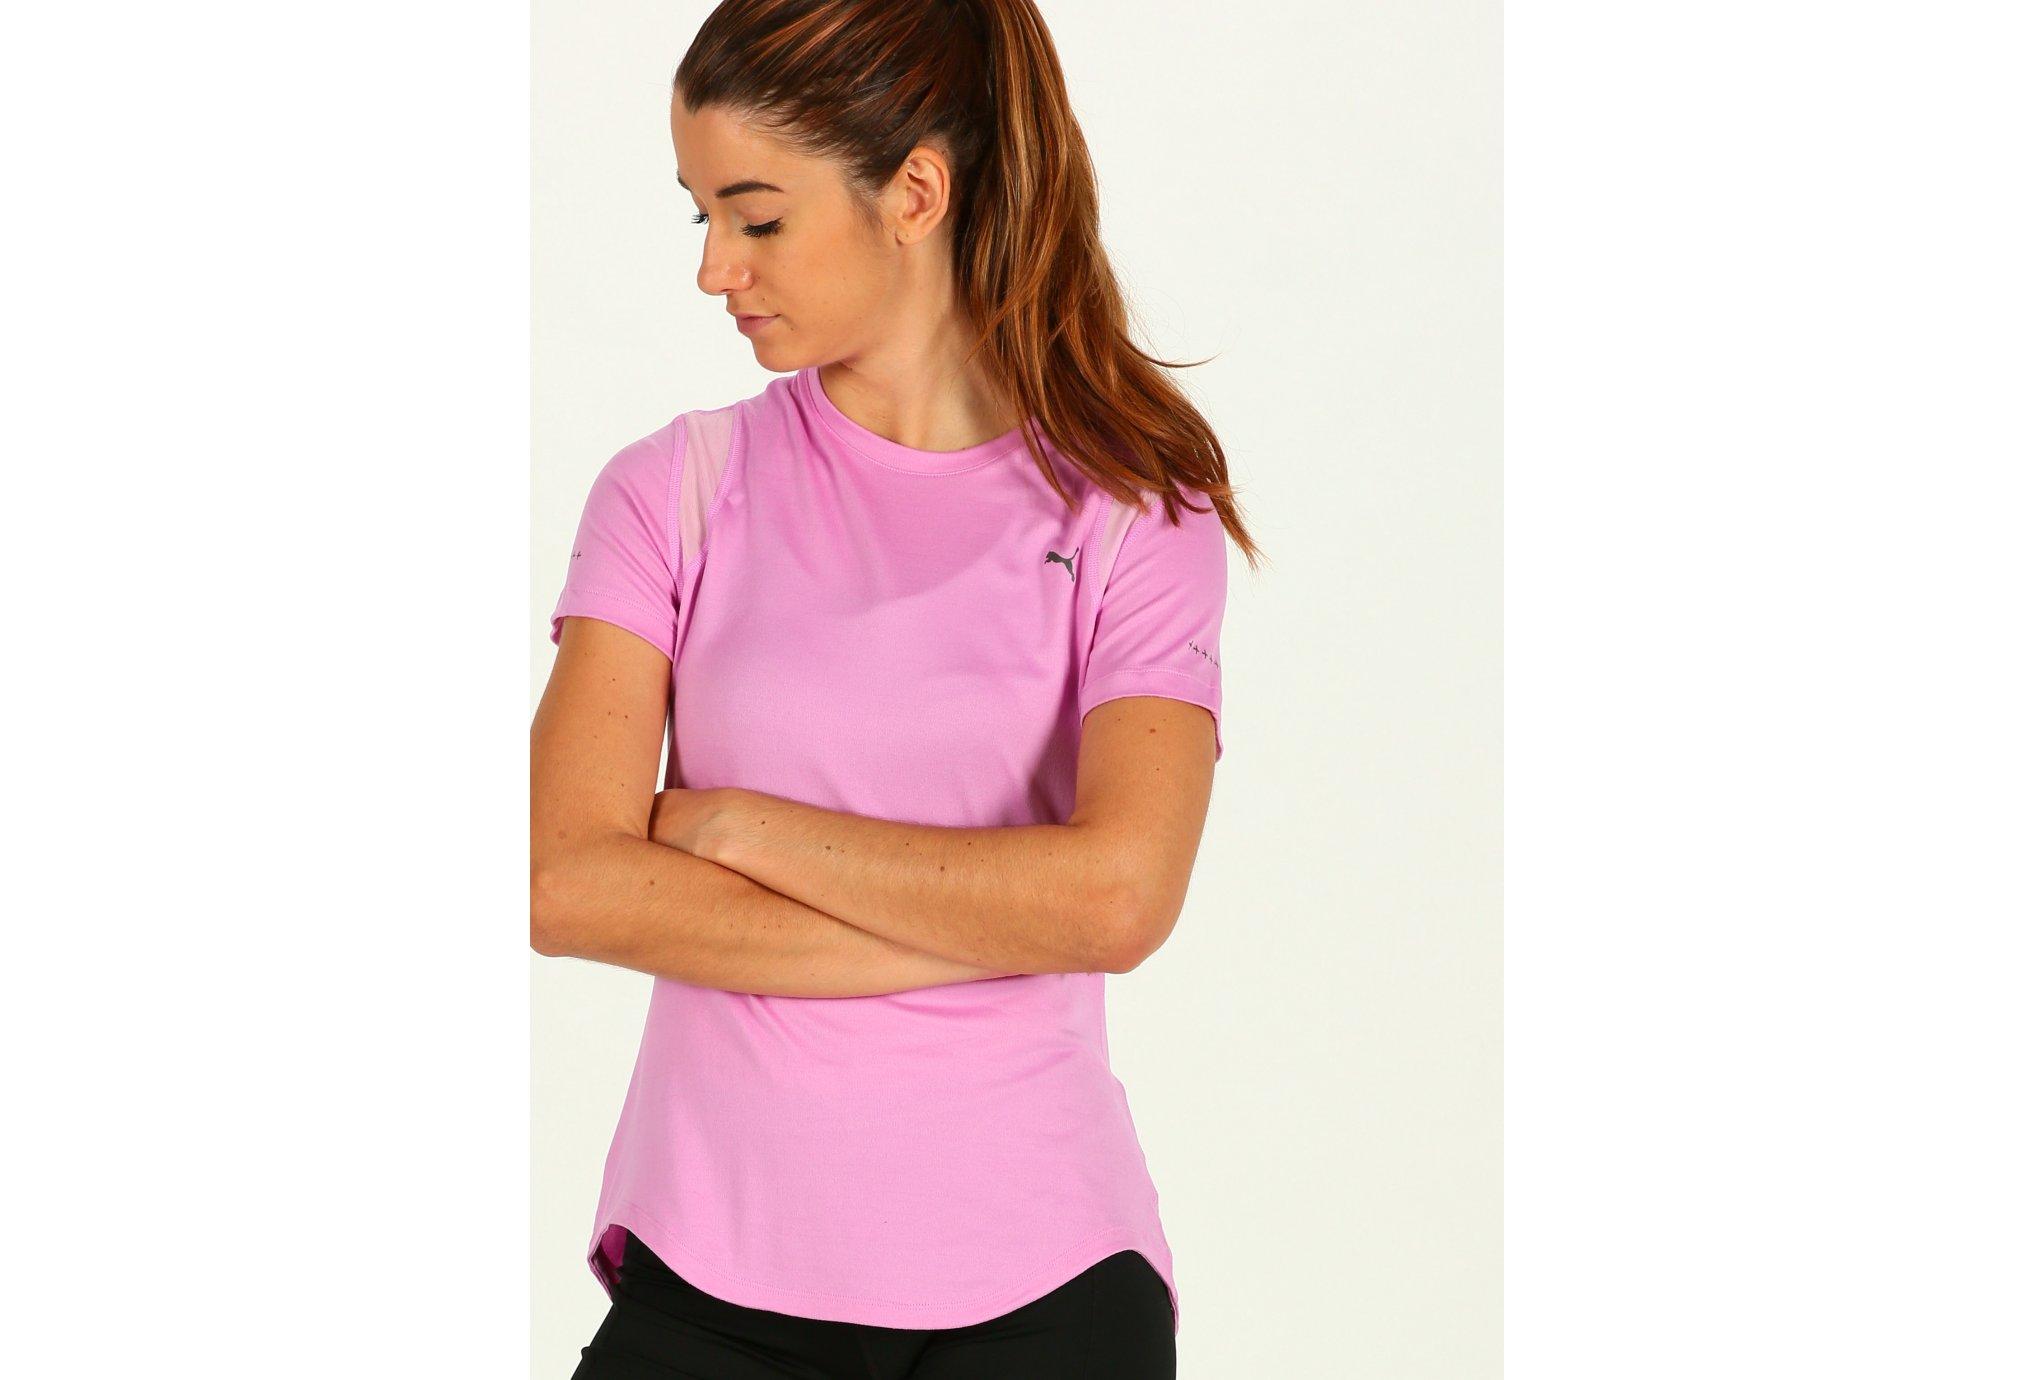 Running Session W Heather Trail Ignite Puma Vêtement Femme 0vNnm8wO